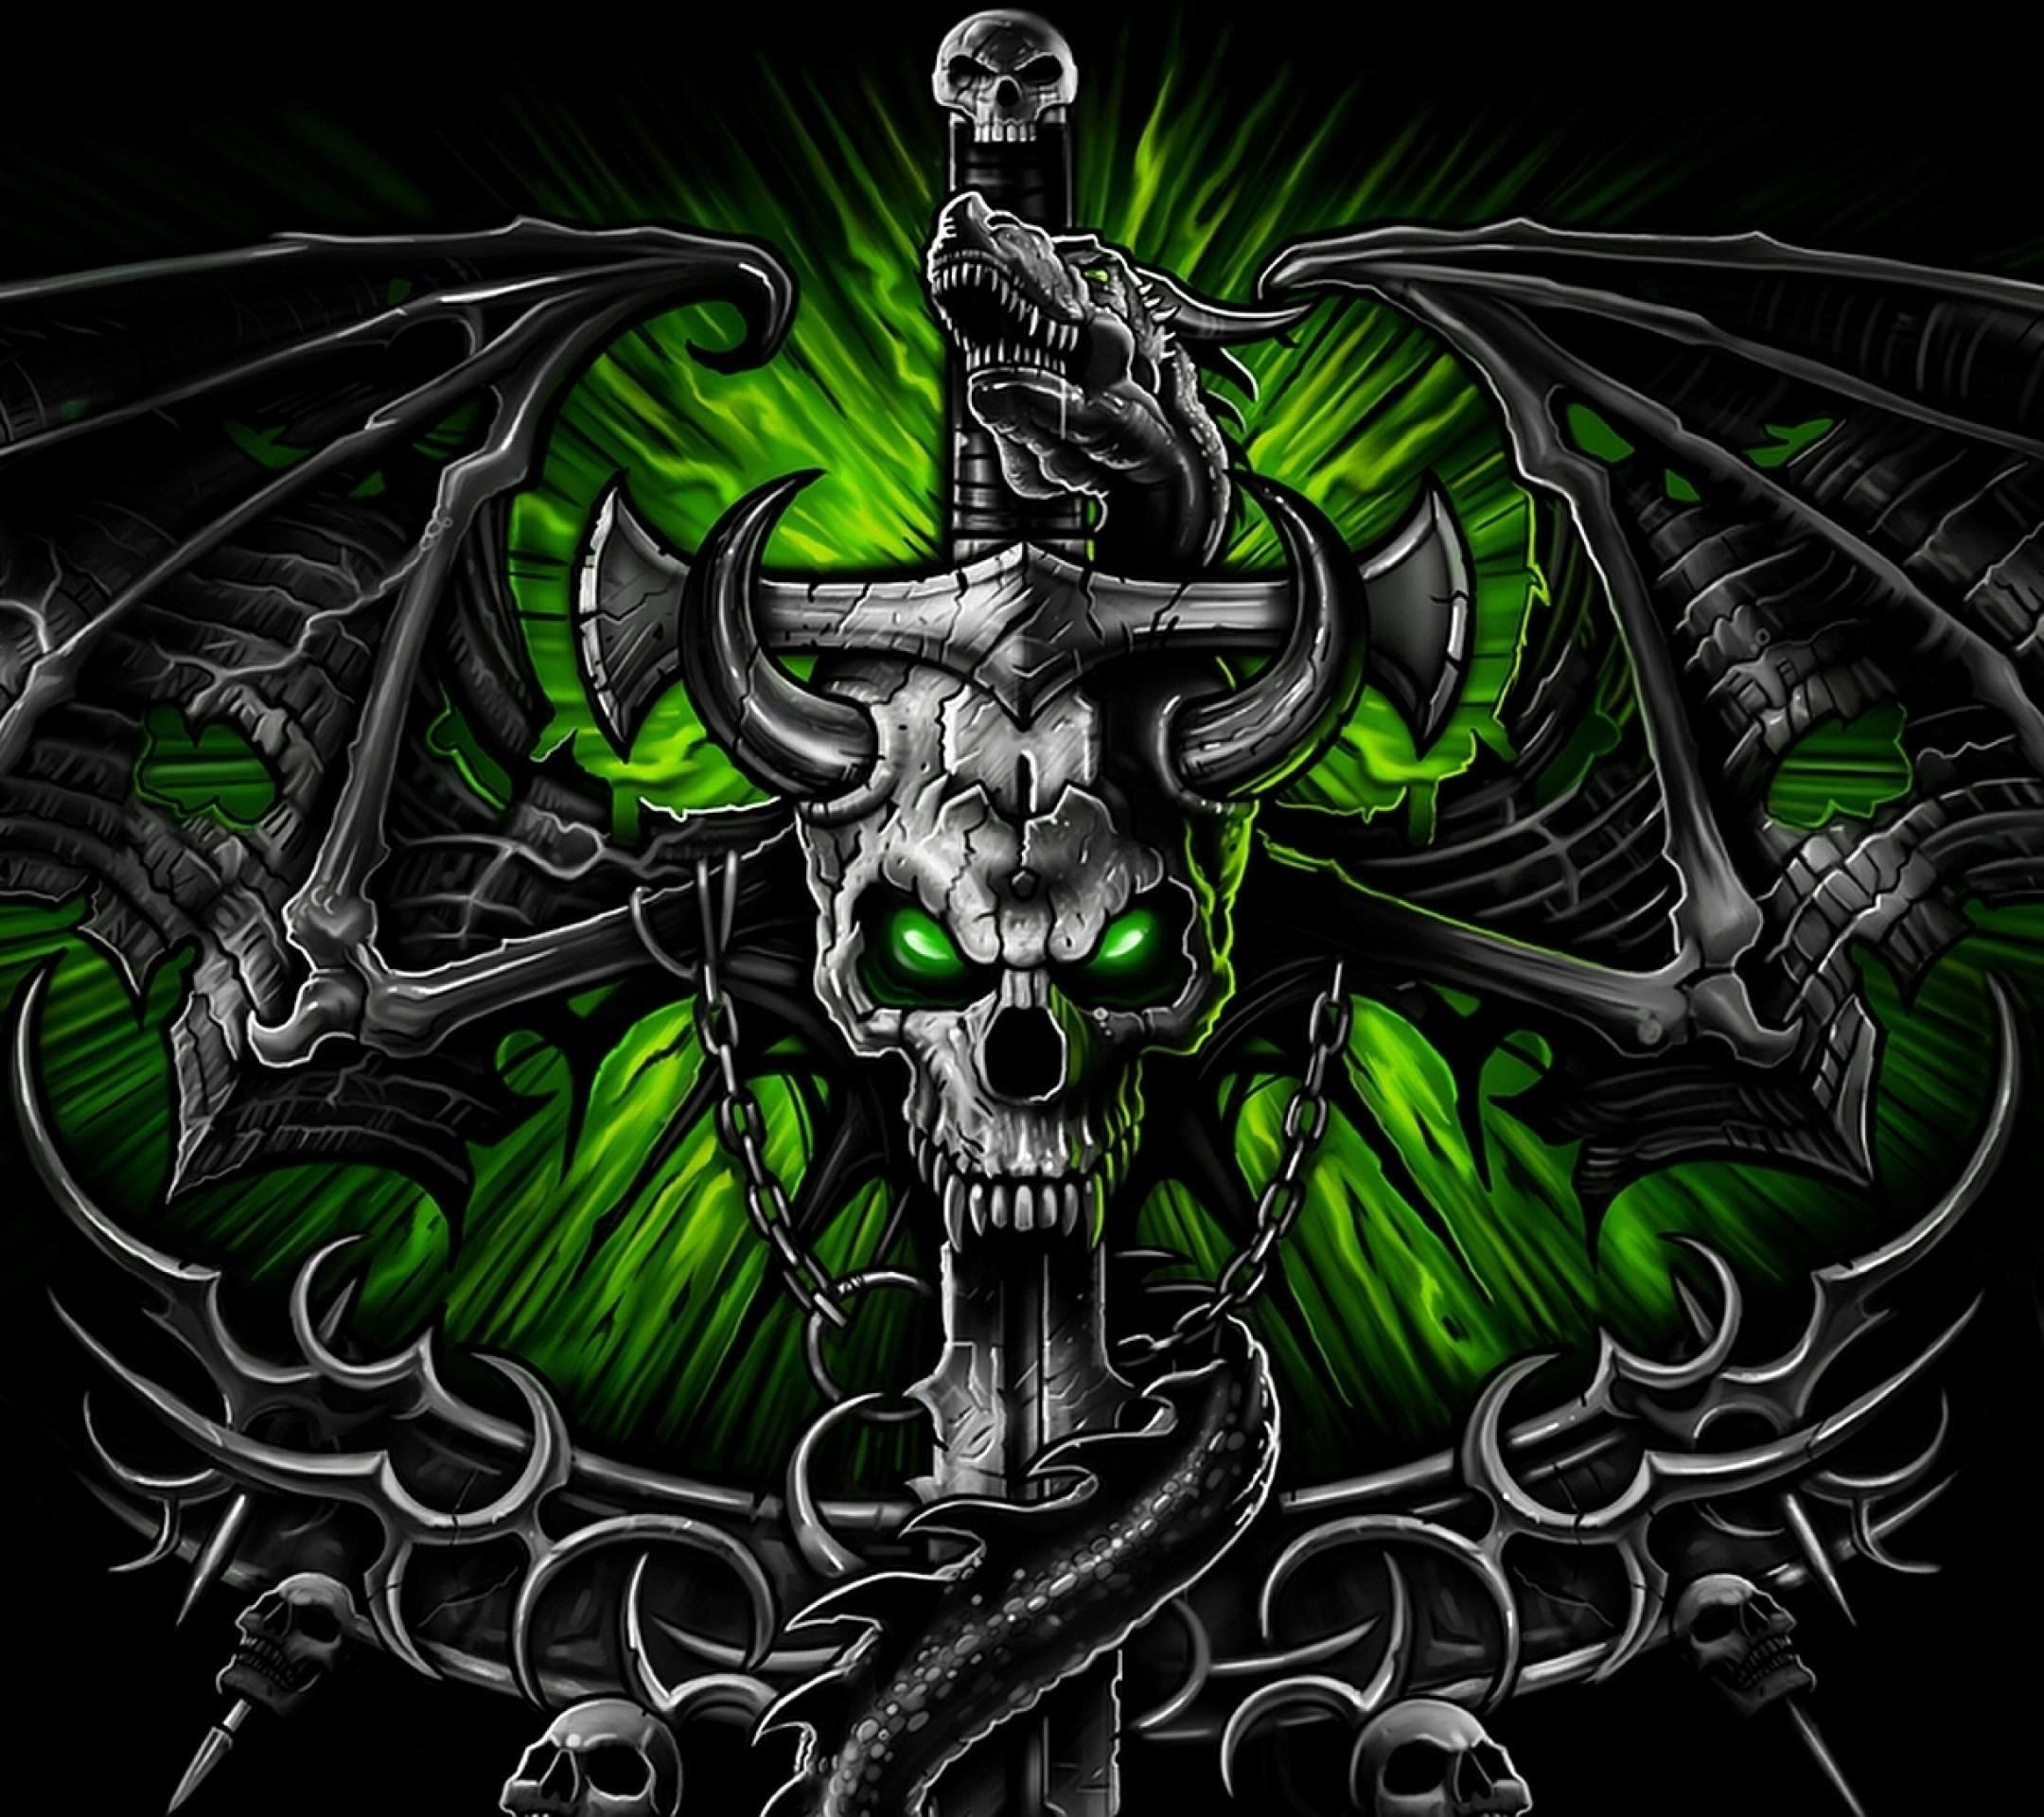 2160x1920 Green Skull Wallpapers - Wallpaper Cave. Download · 1080x1920